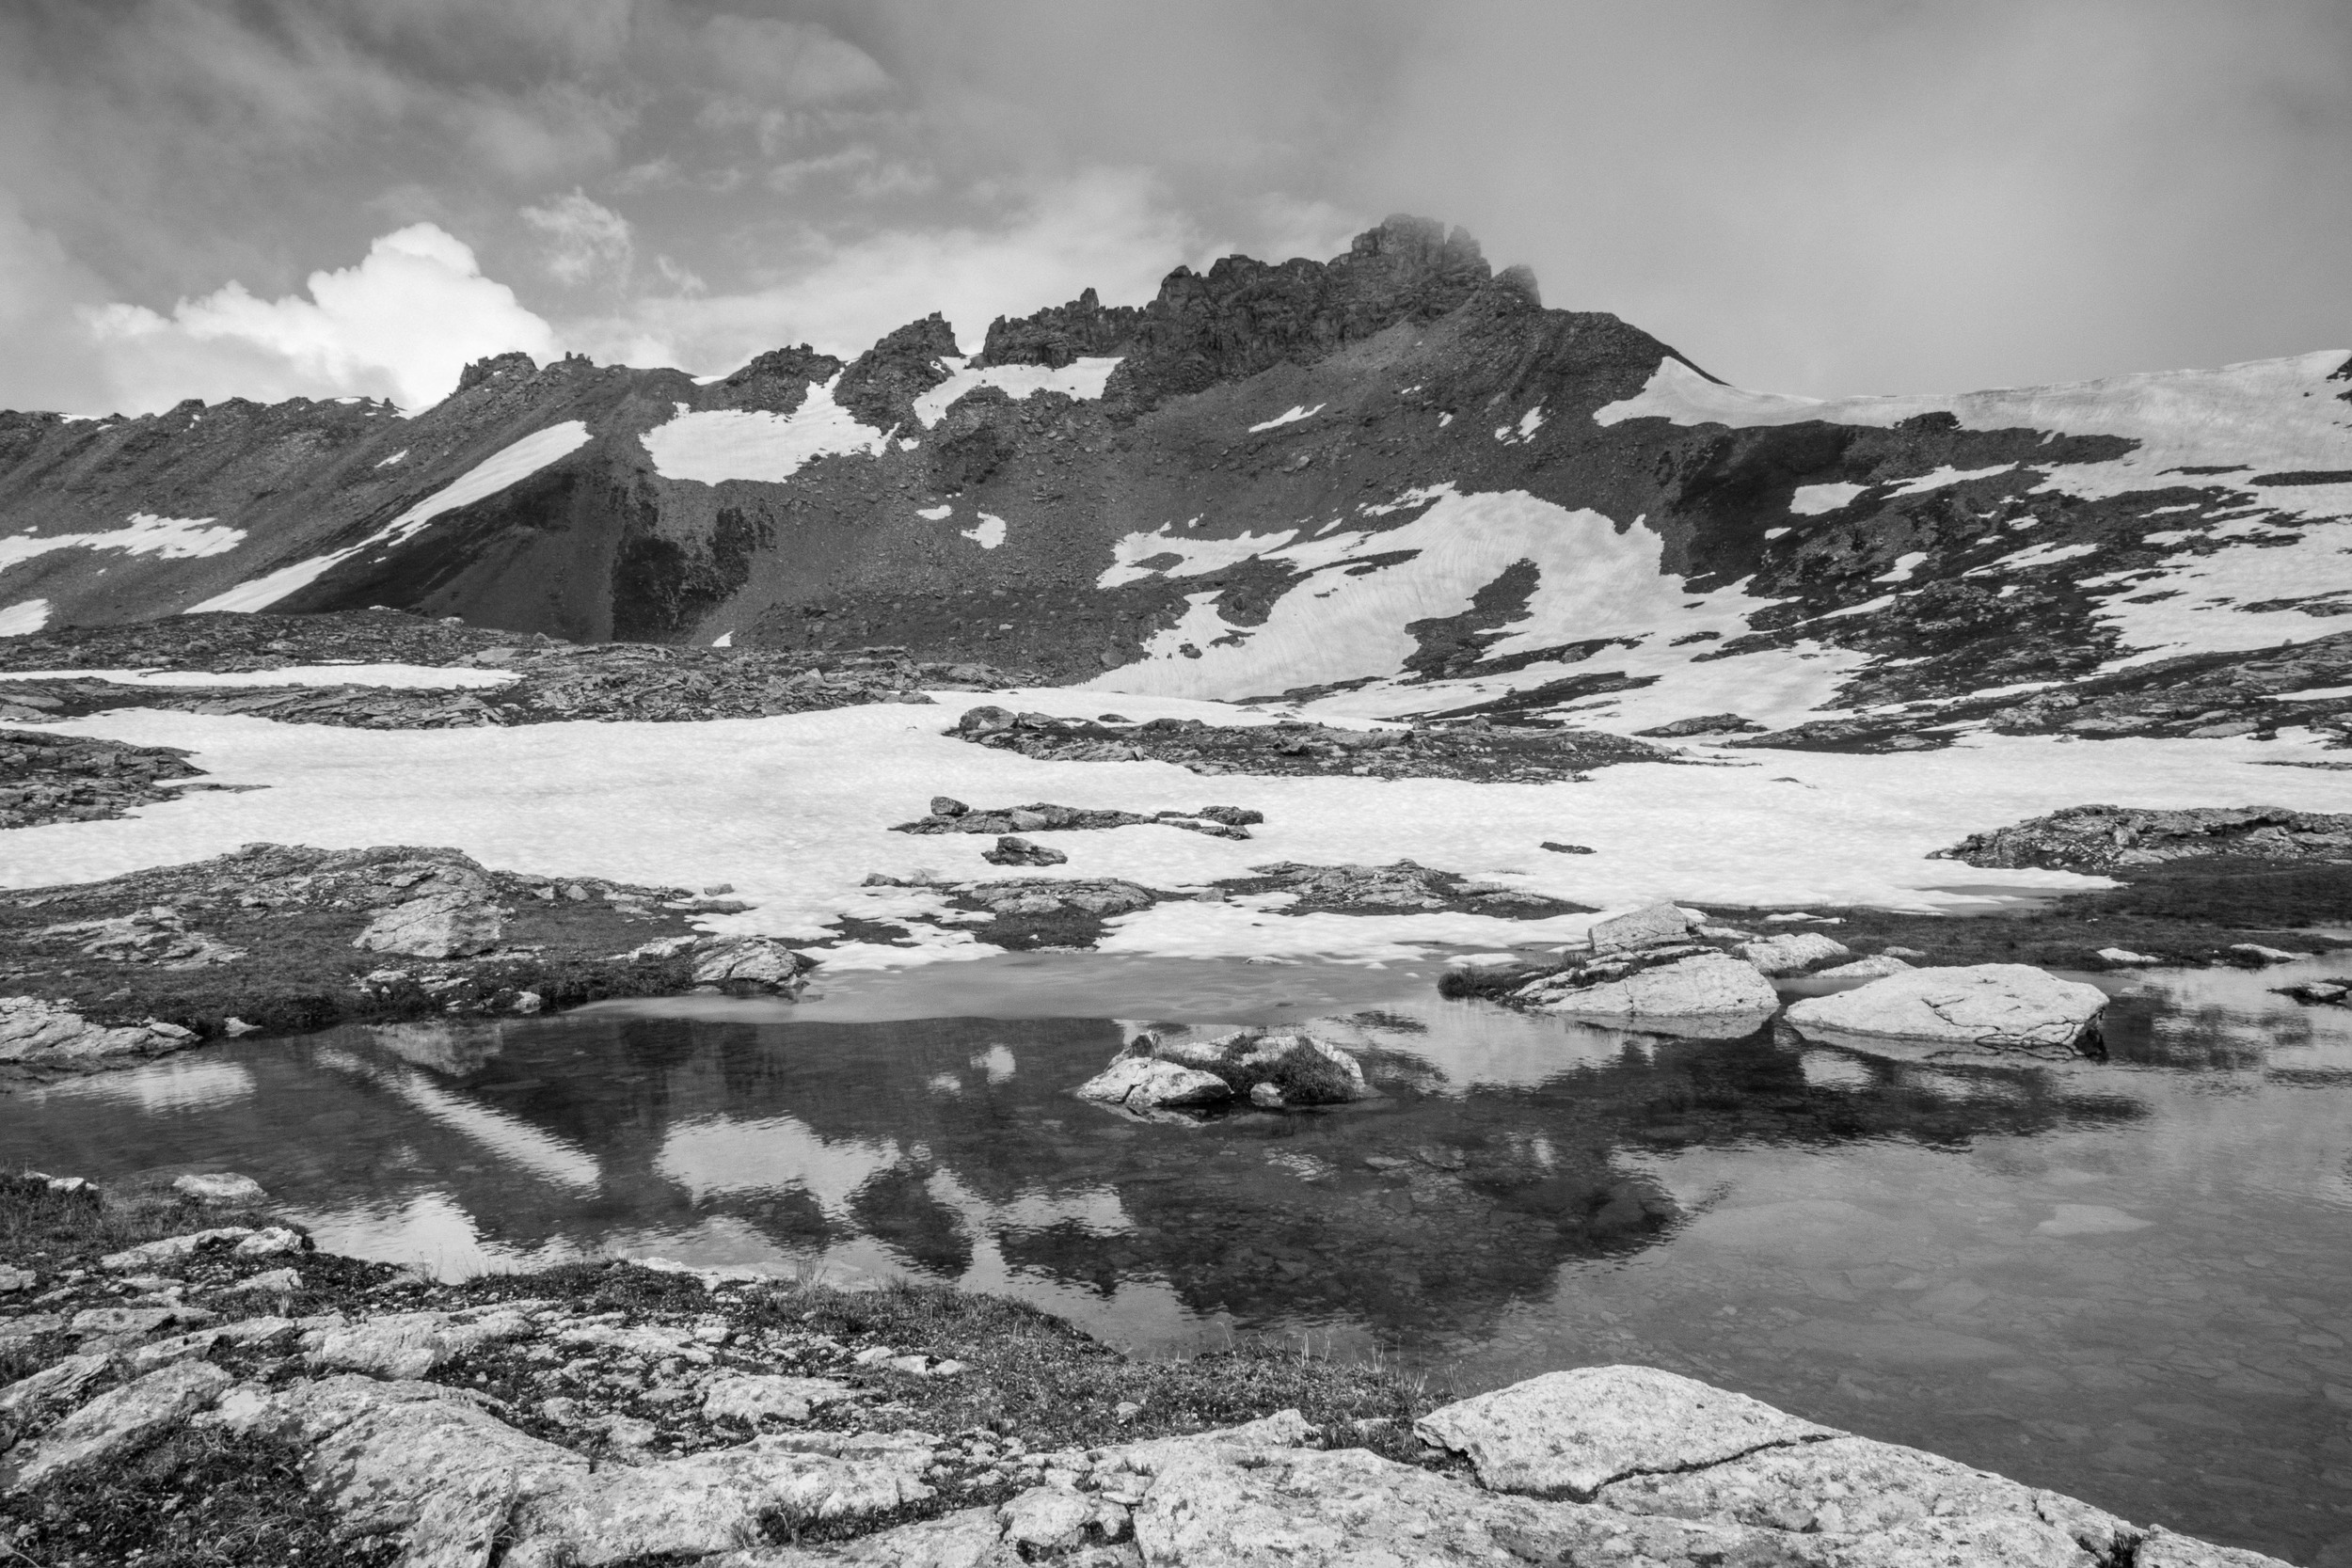 Porphyry Basin Reflection, Image #5582